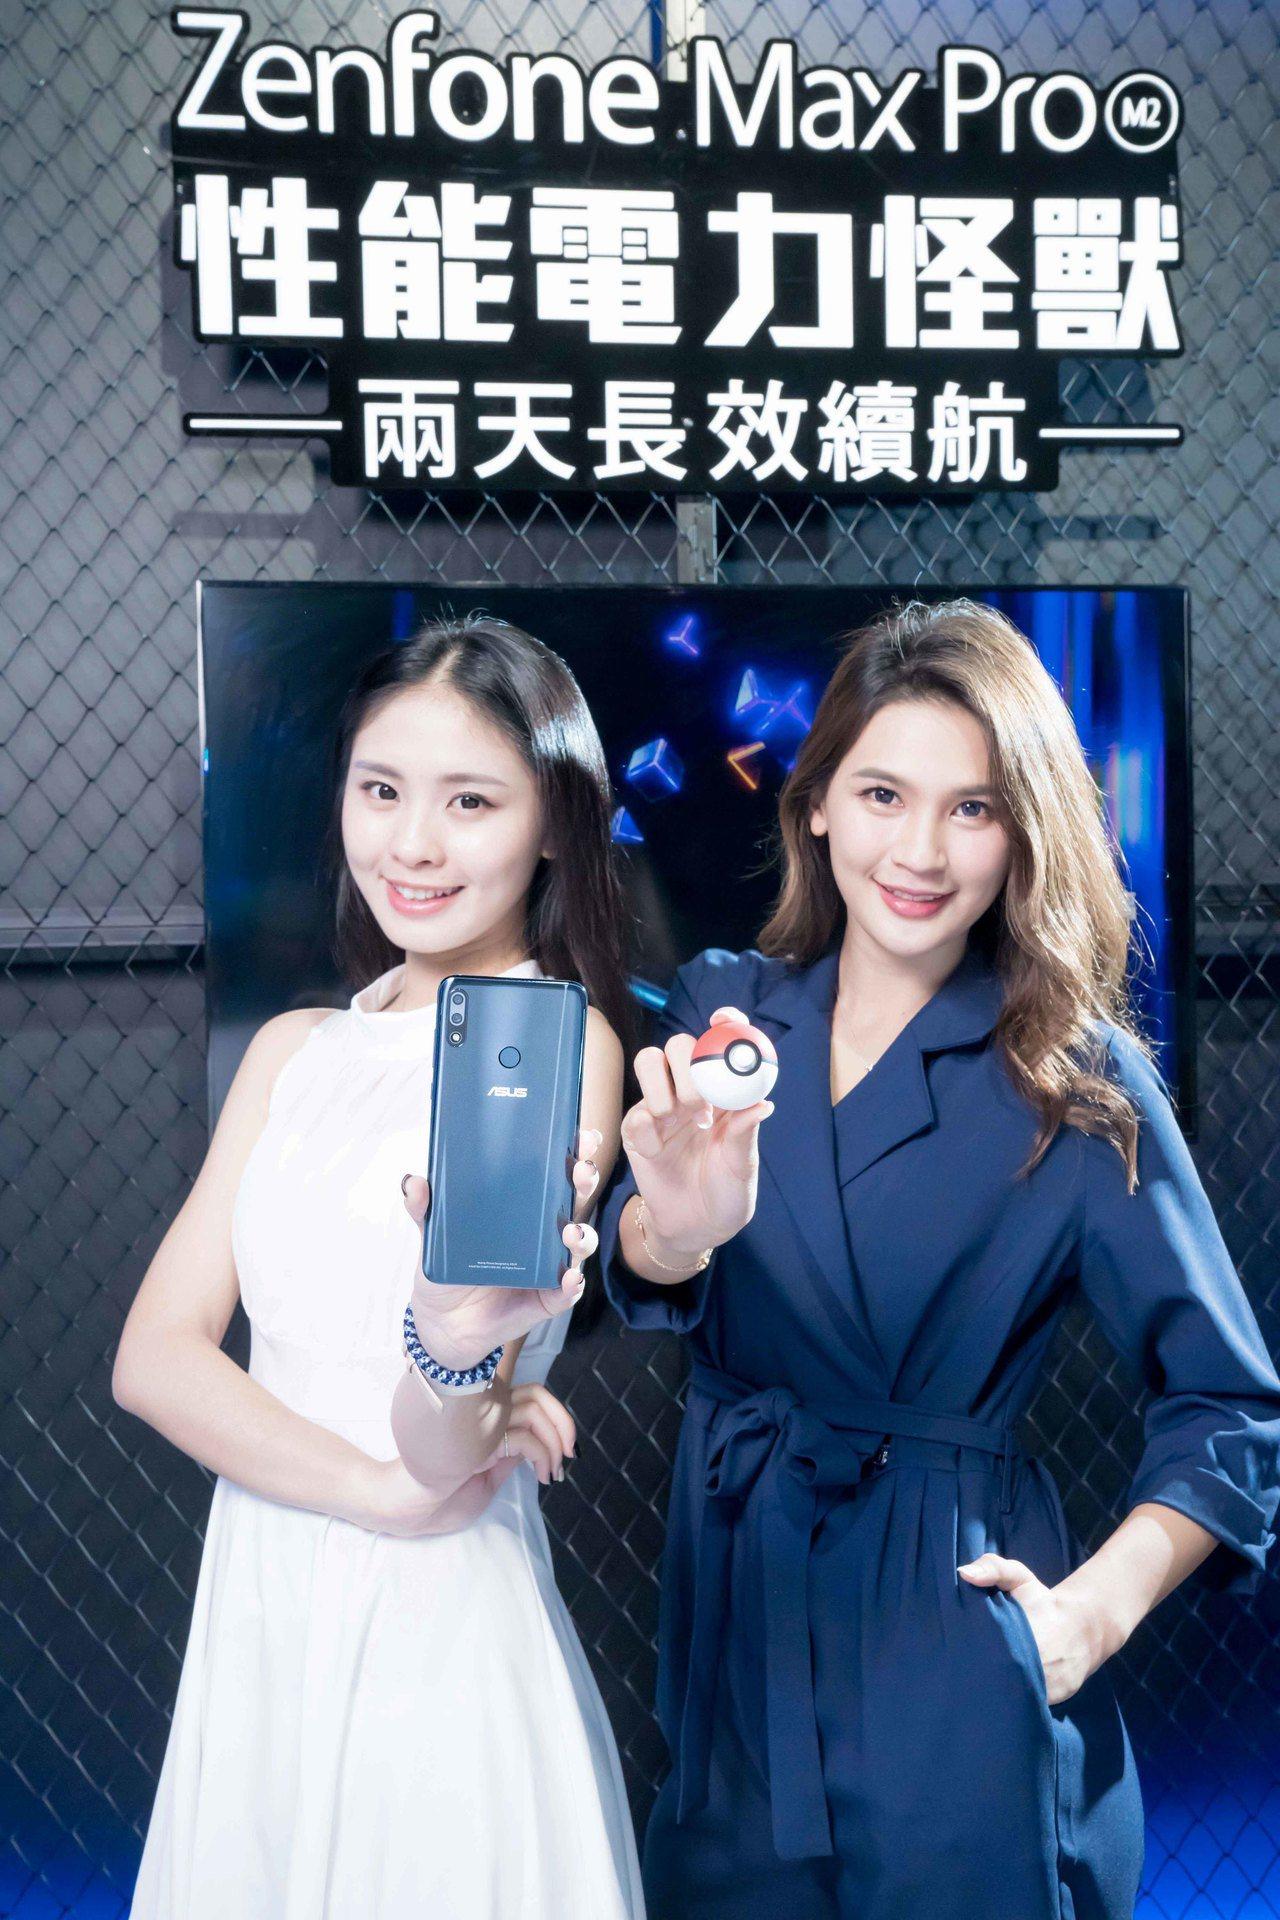 ASUS ZenFone Max Pro (M2)今上市,首批早鳥禮限量贈送任天...